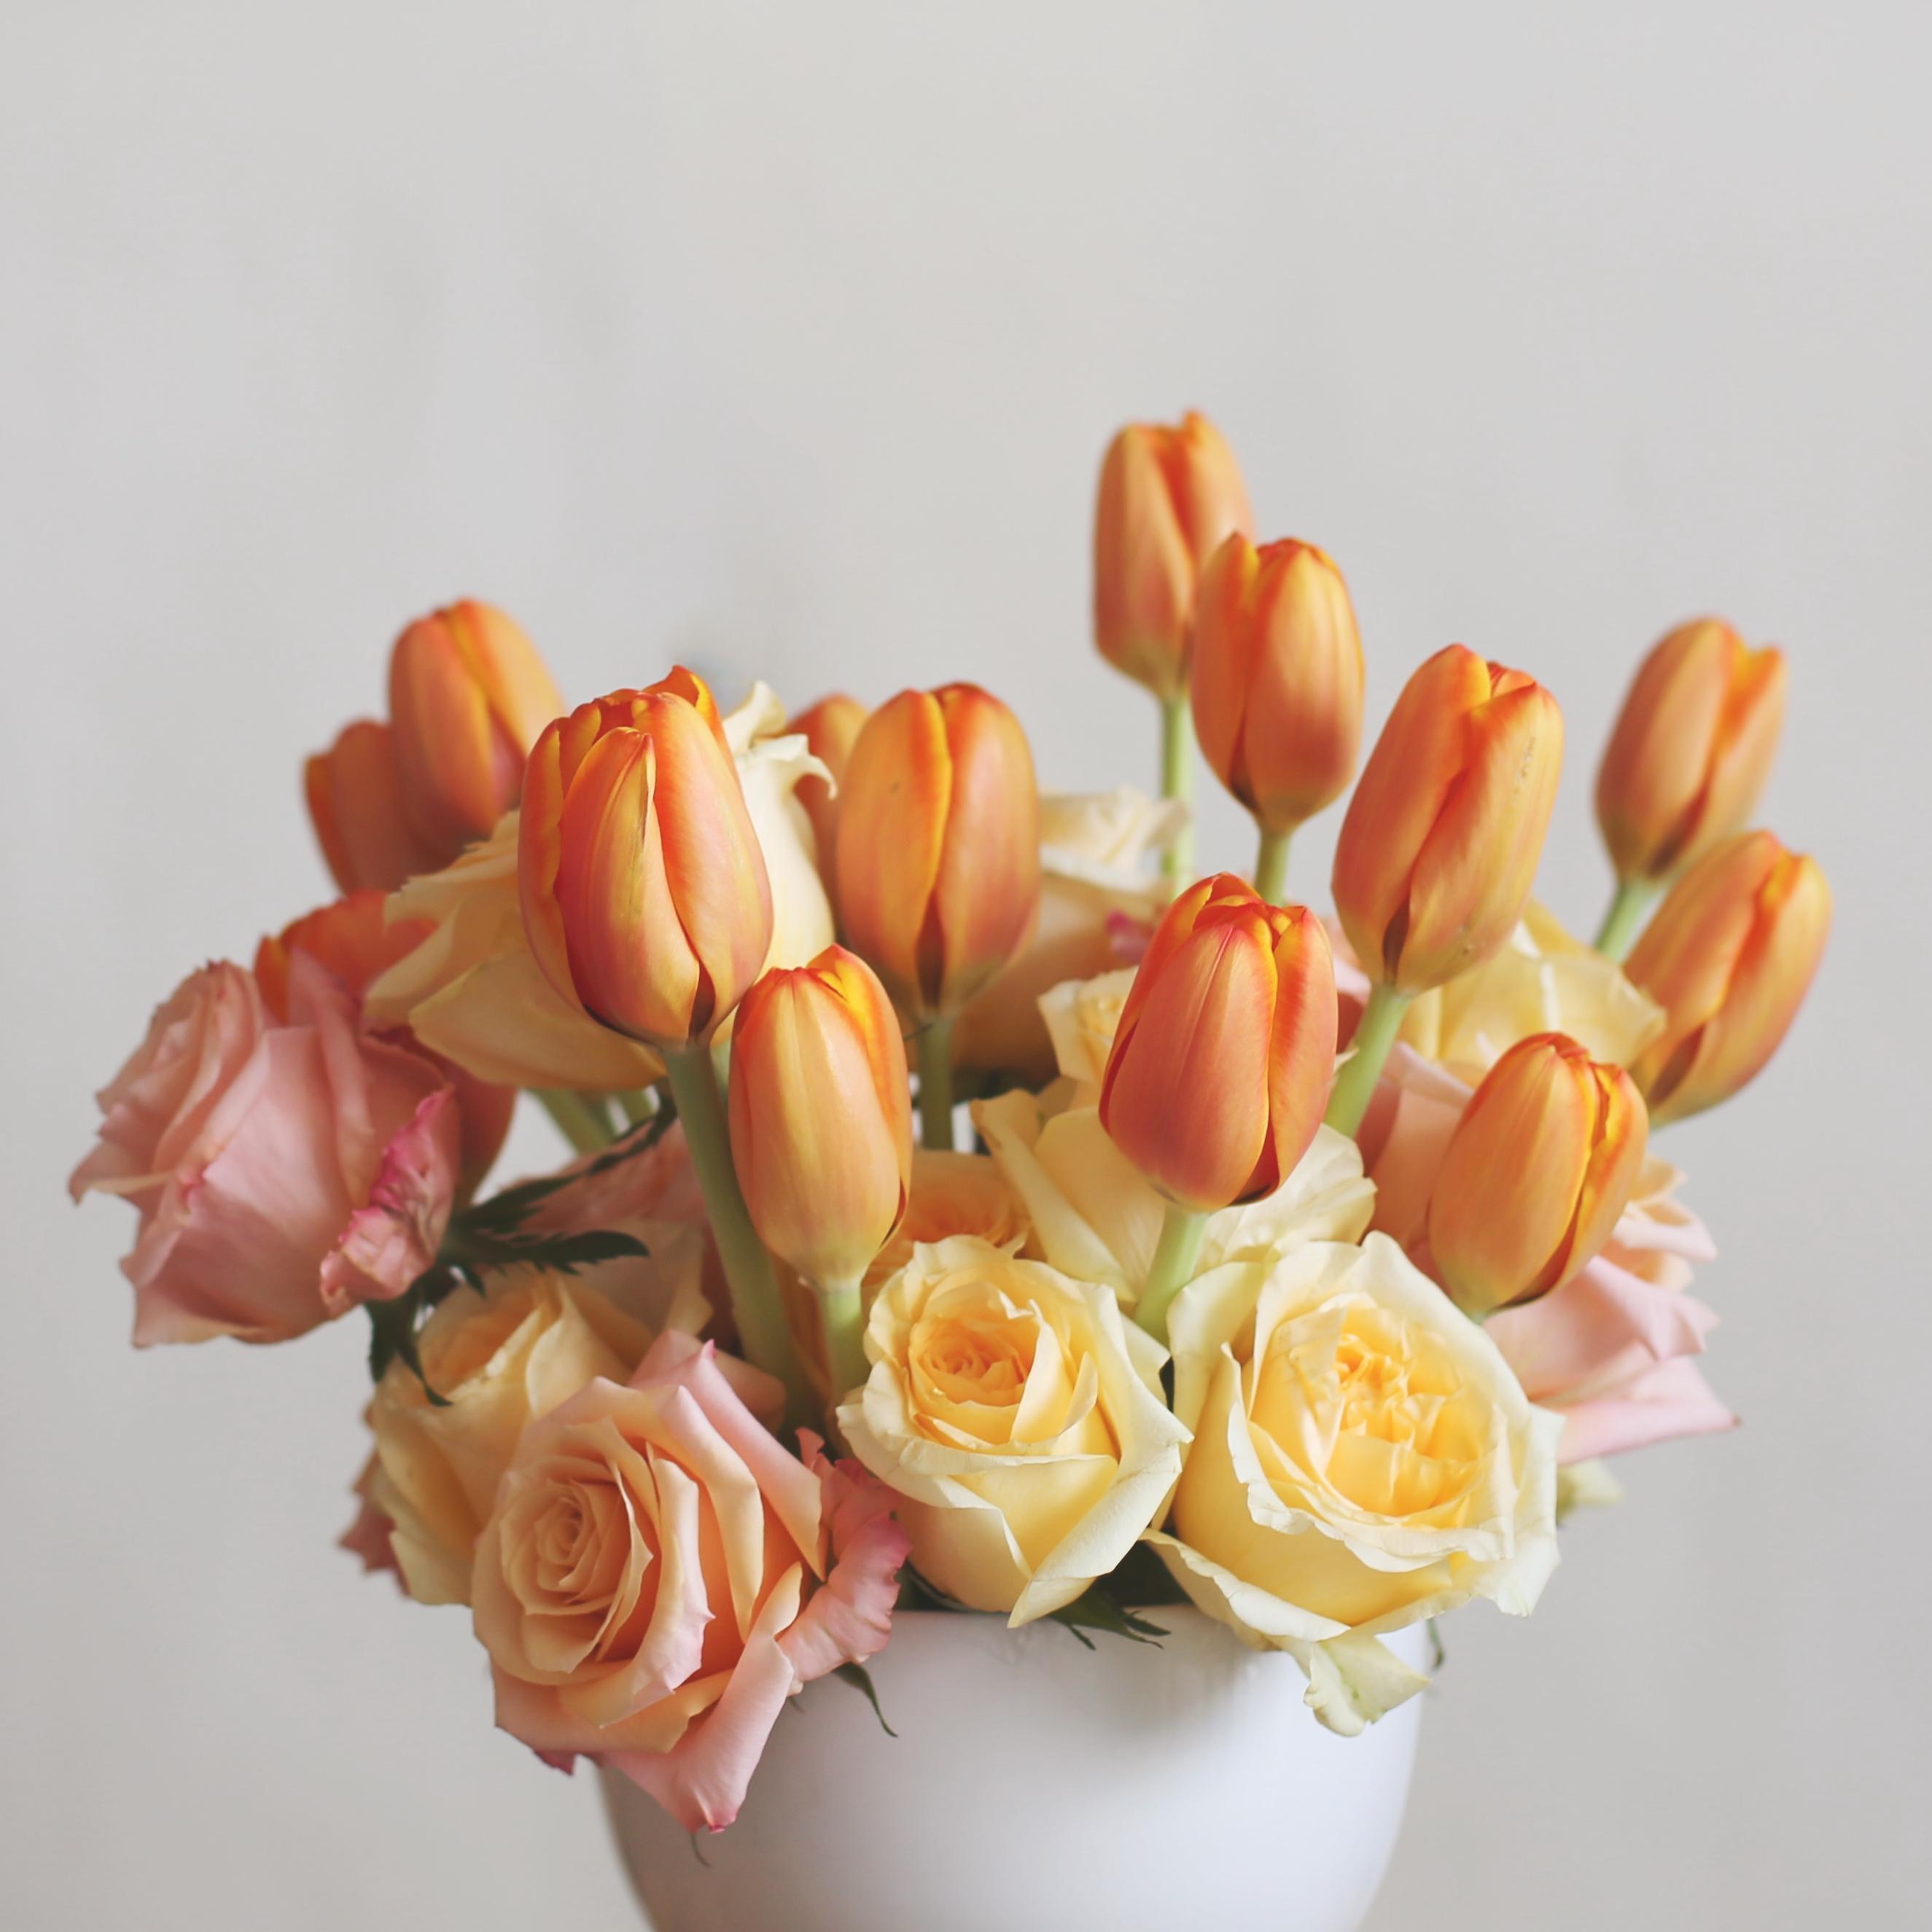 Extra Custom Vase Arrangement